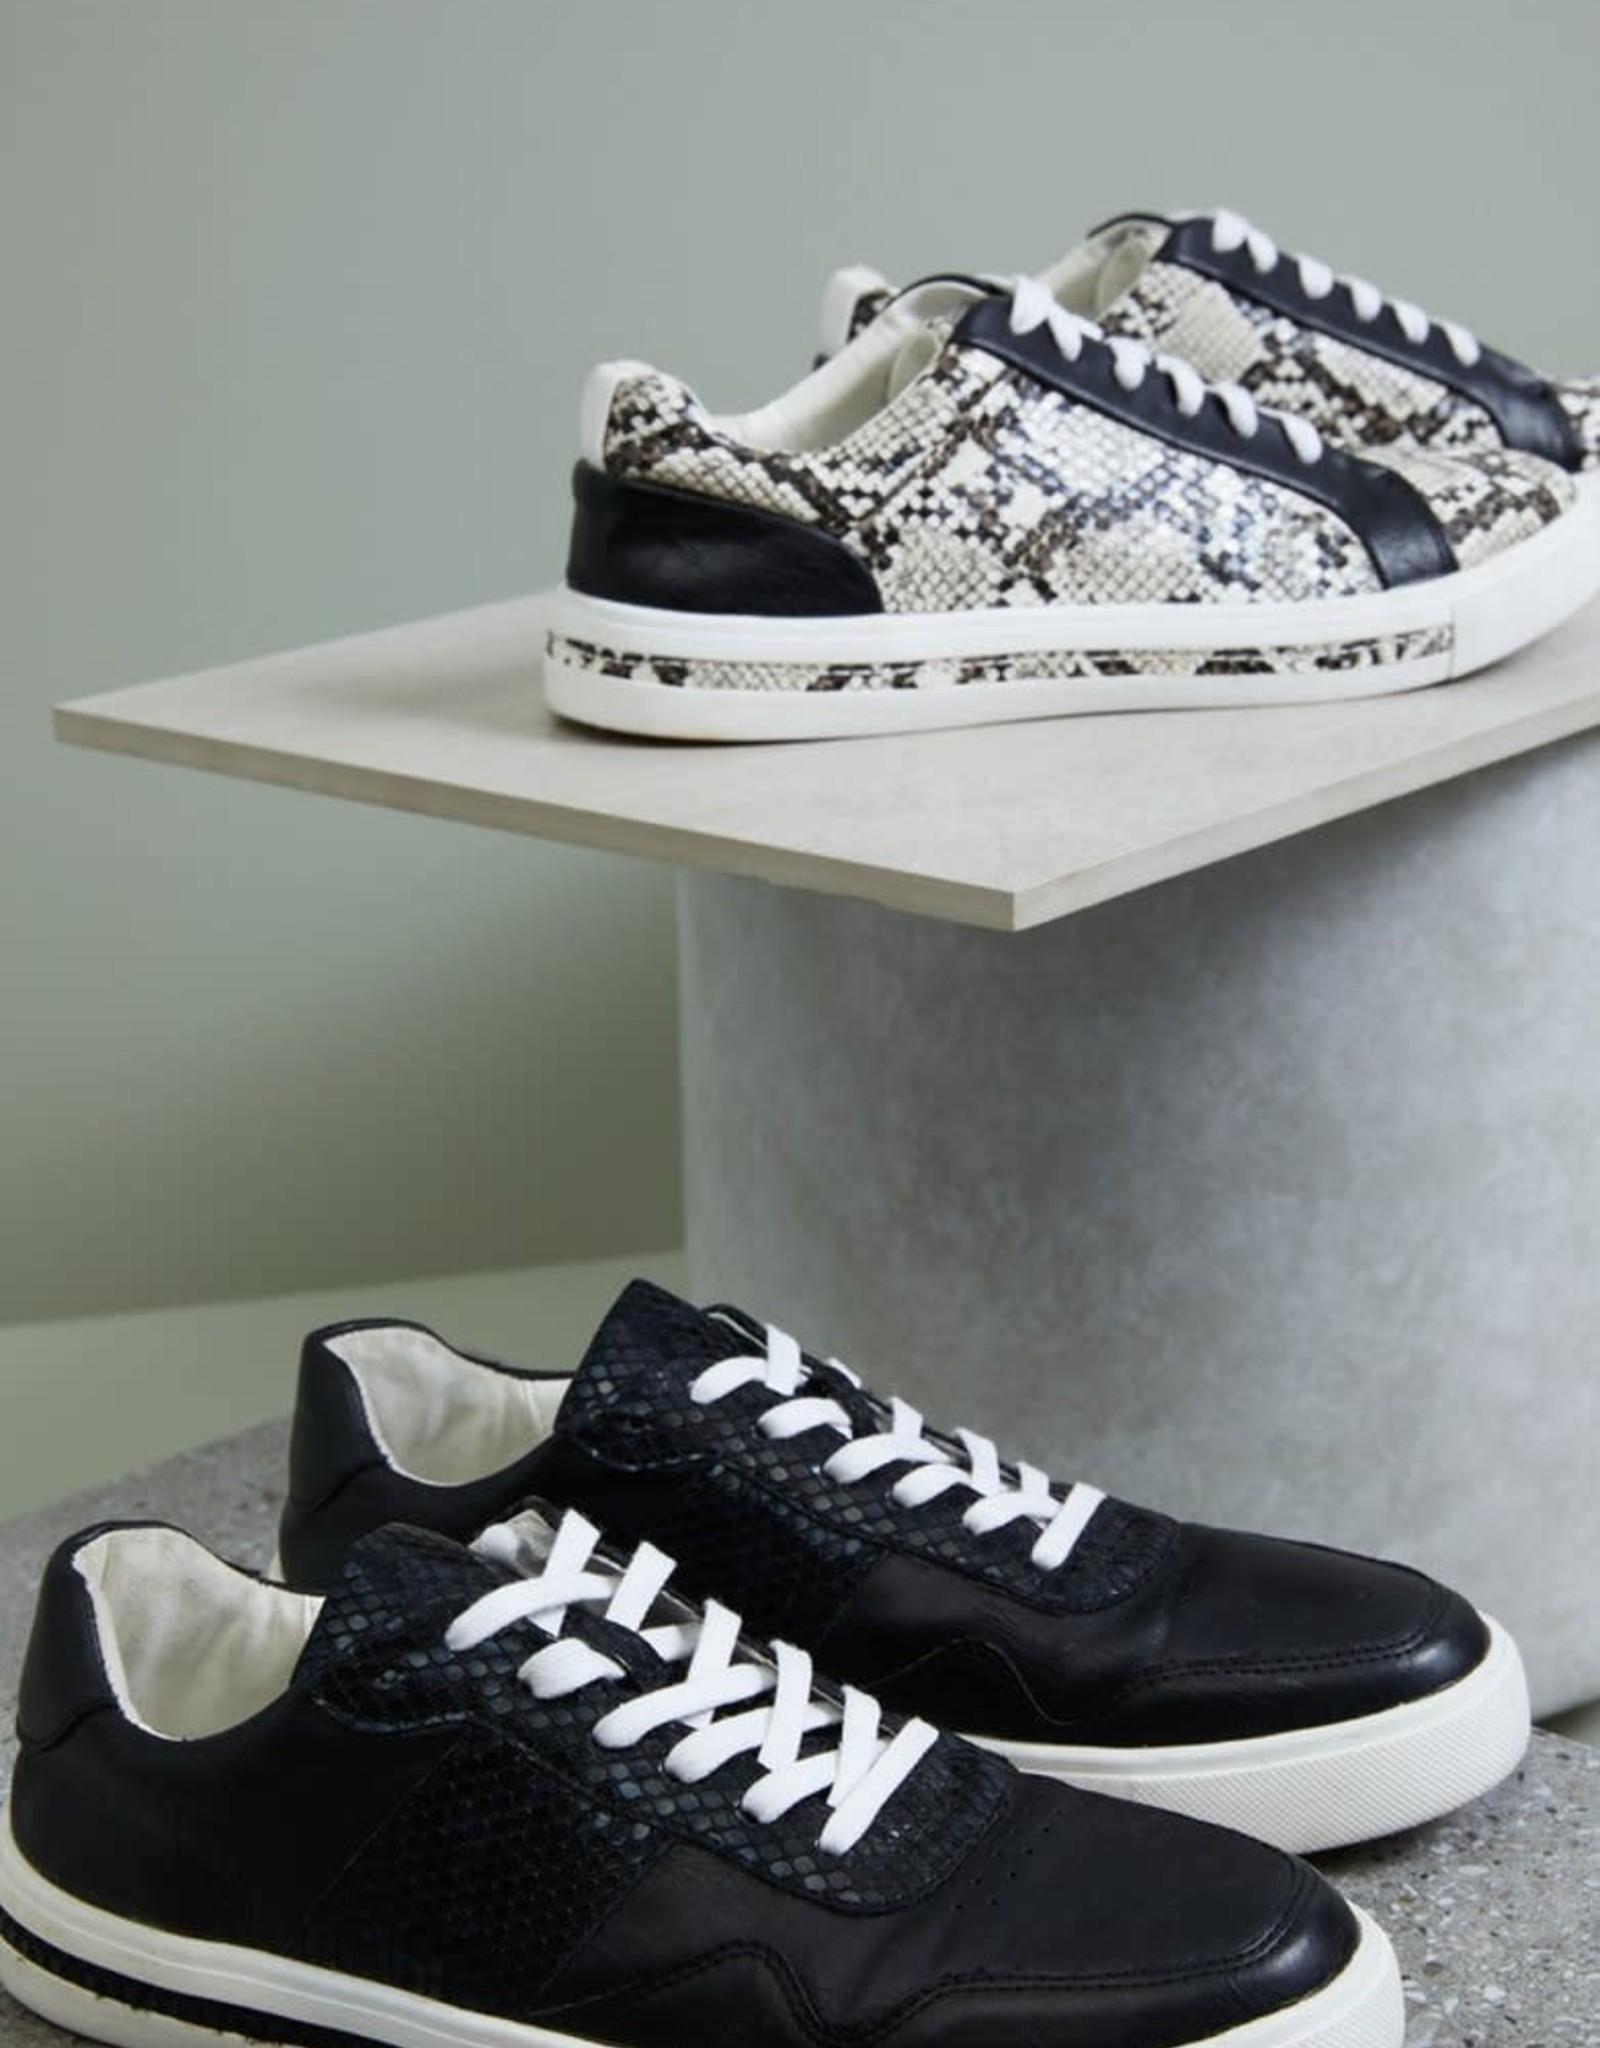 EB&IVE eb&ive - Lazy Dayz Sneaker (Snake) - 2450401